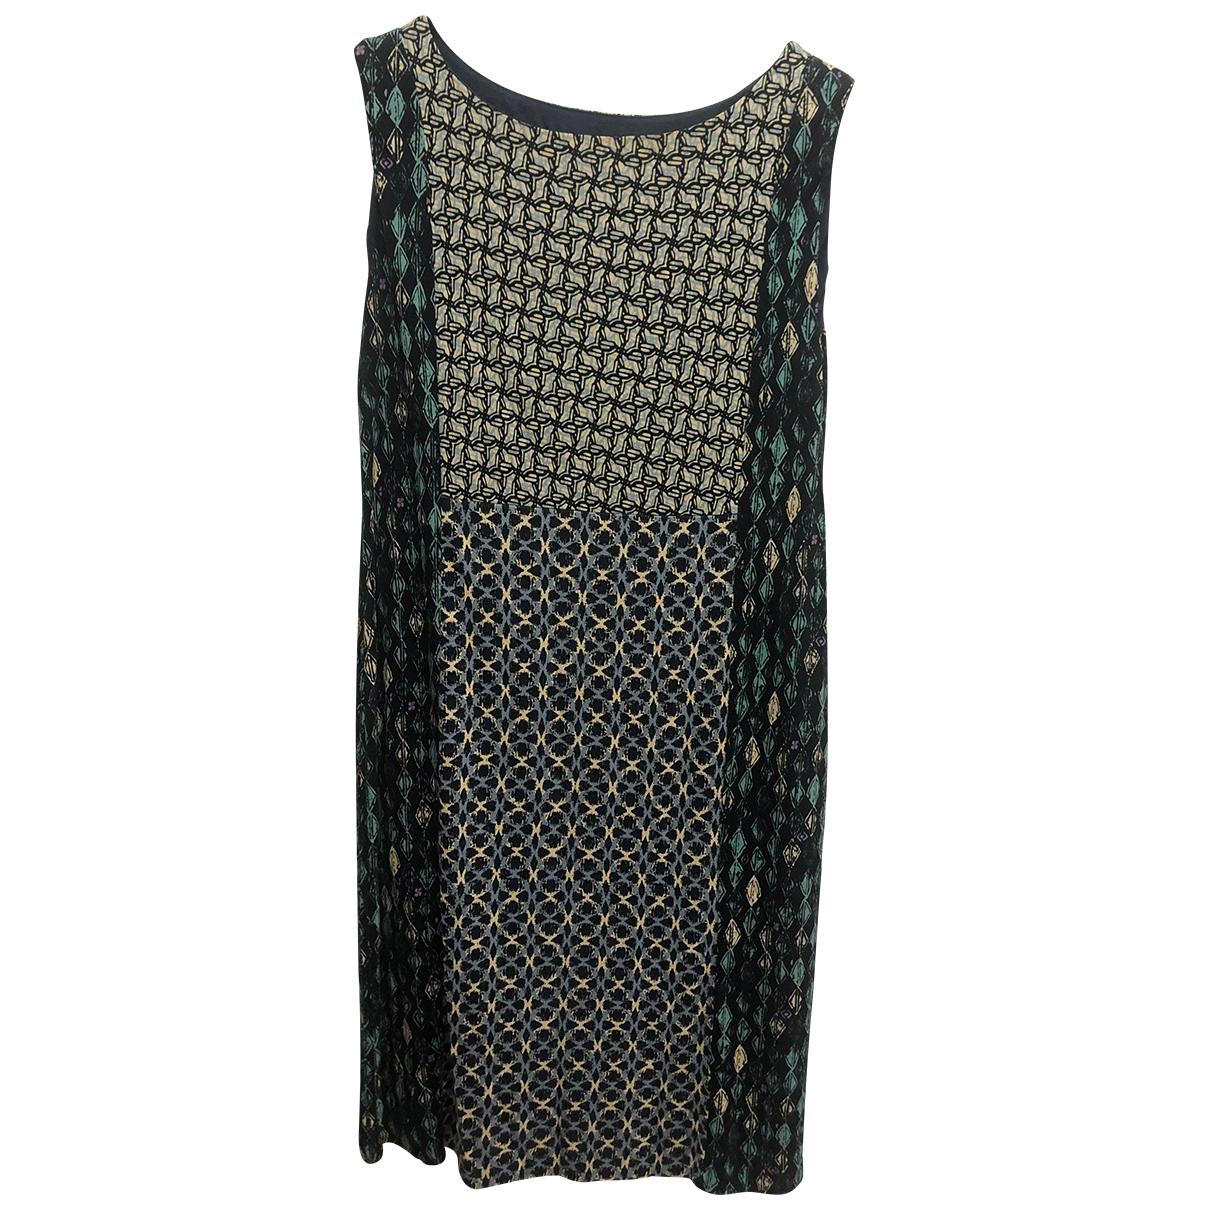 Maliparmi \N Kleid in  Blau Synthetik